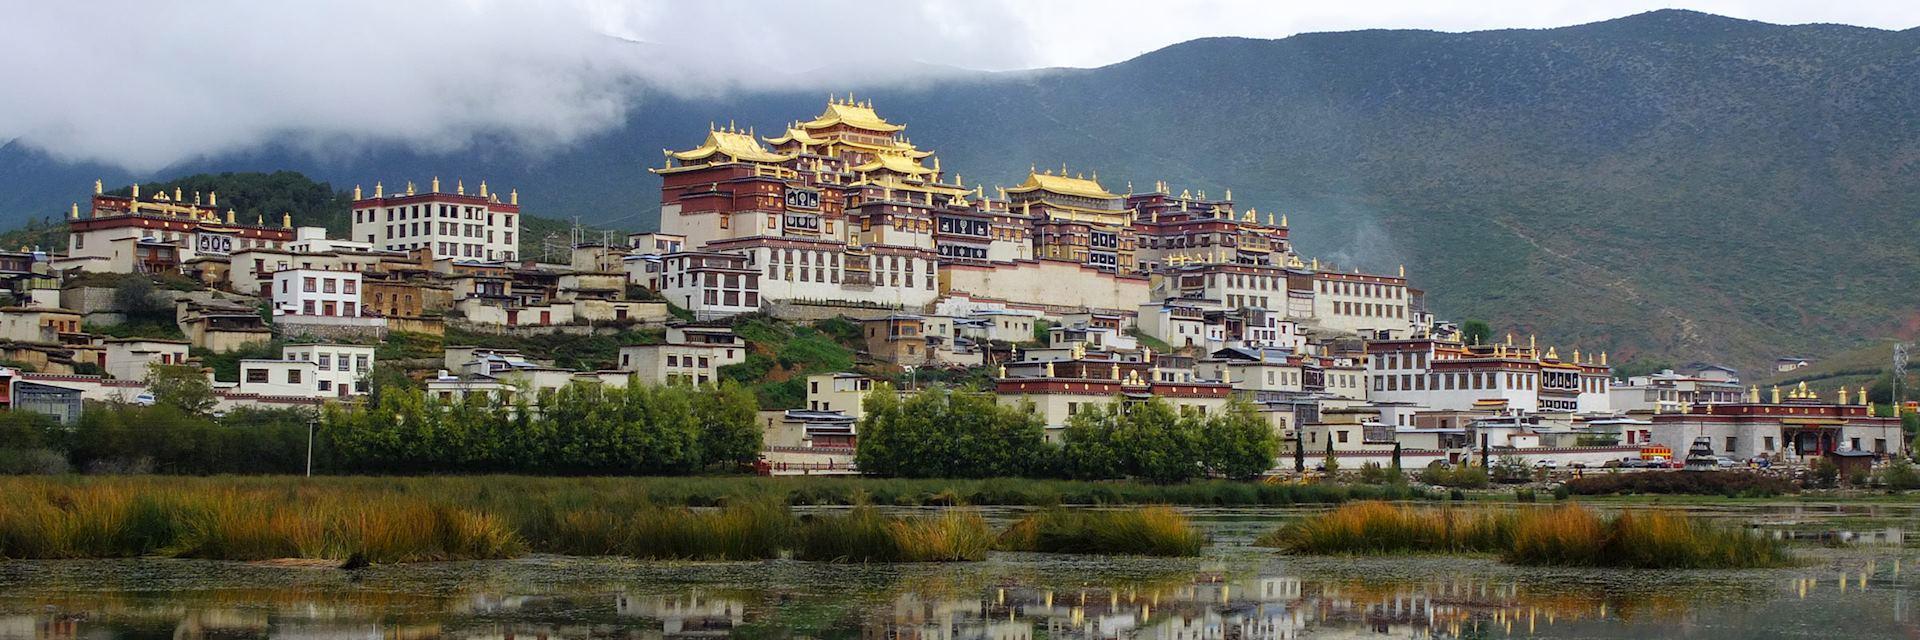 Songzanlin Monastery, Zhongdian